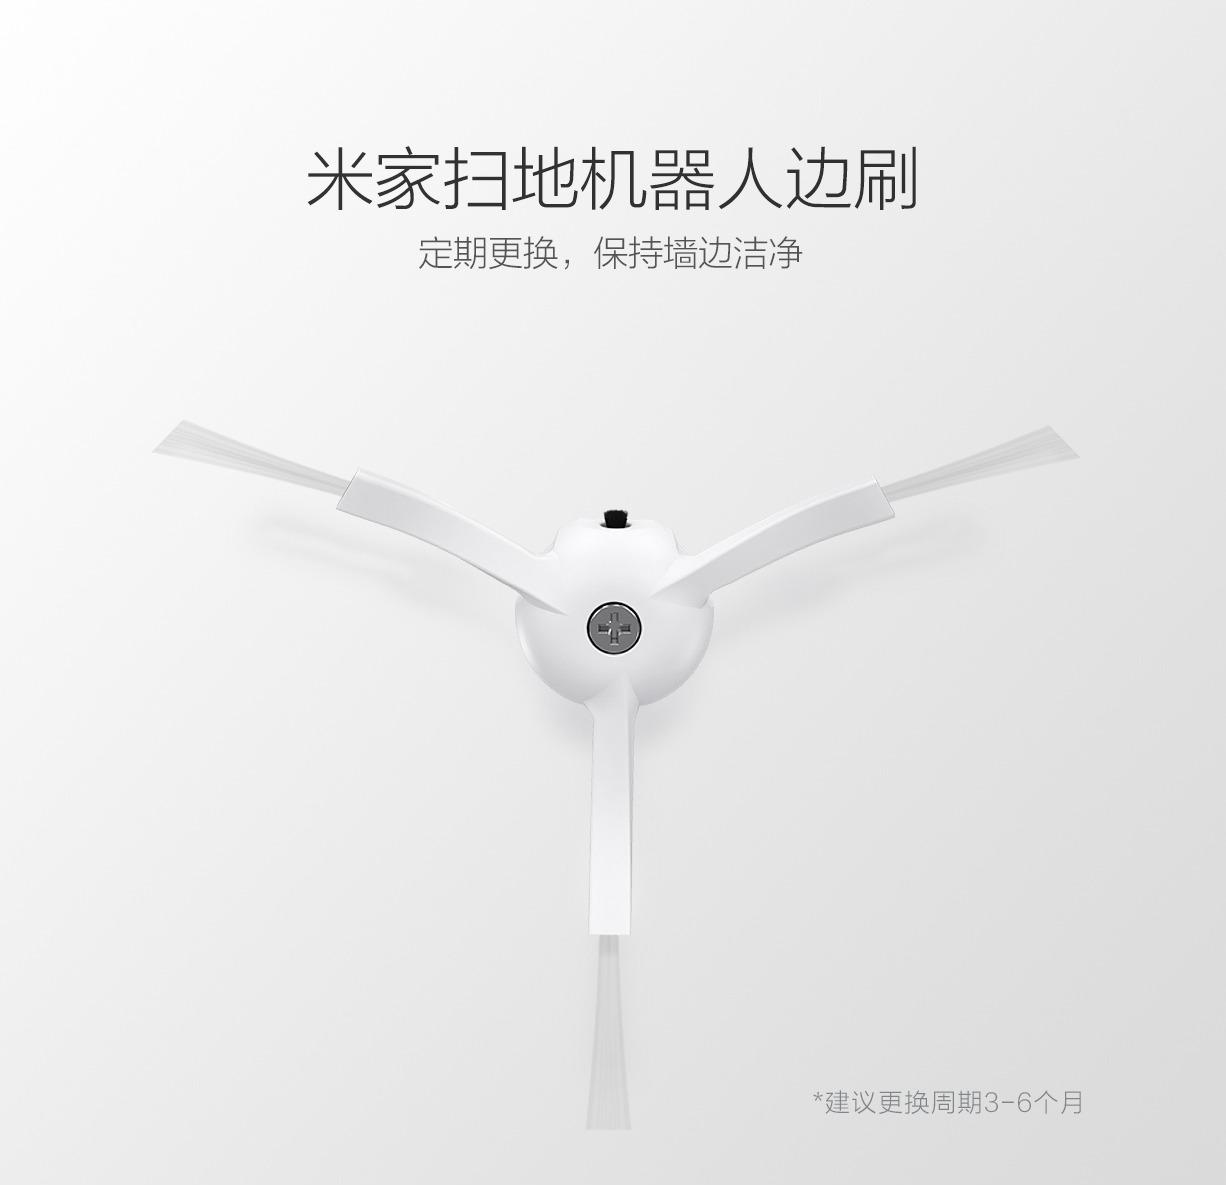 product_奇妙_米家扫地机器人边刷